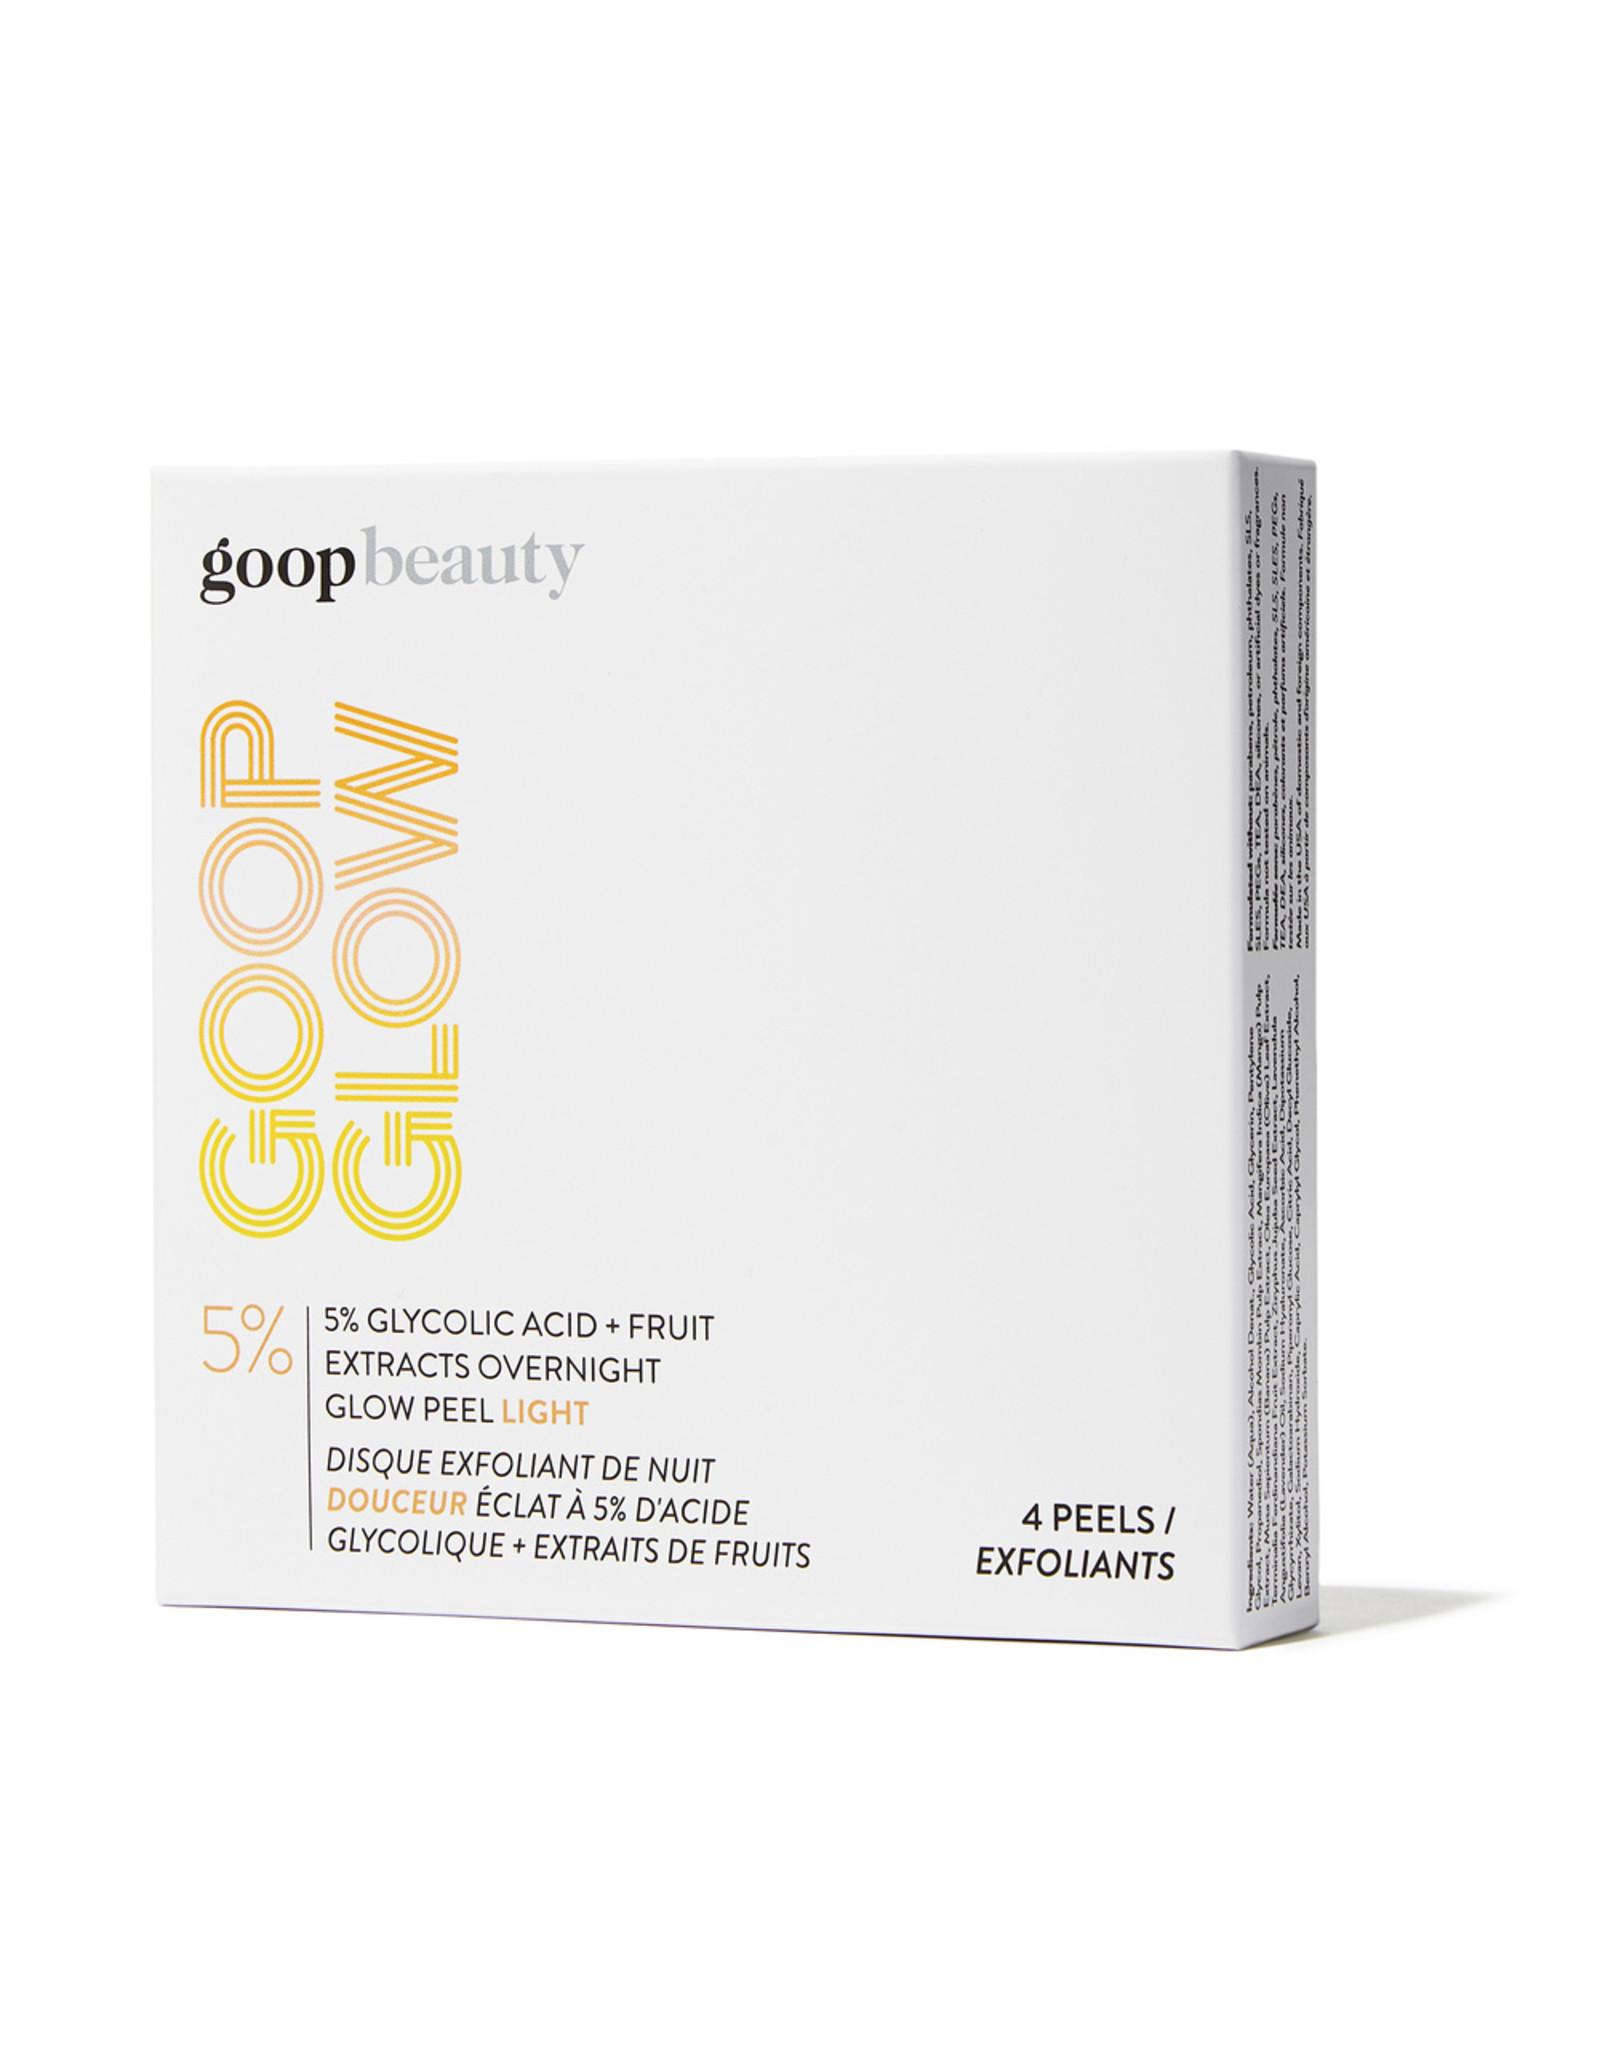 goop Beauty goop Beauty GOOPGLOW 5% Glycolic Acid Overnight Glow Peel Light 4-Pack